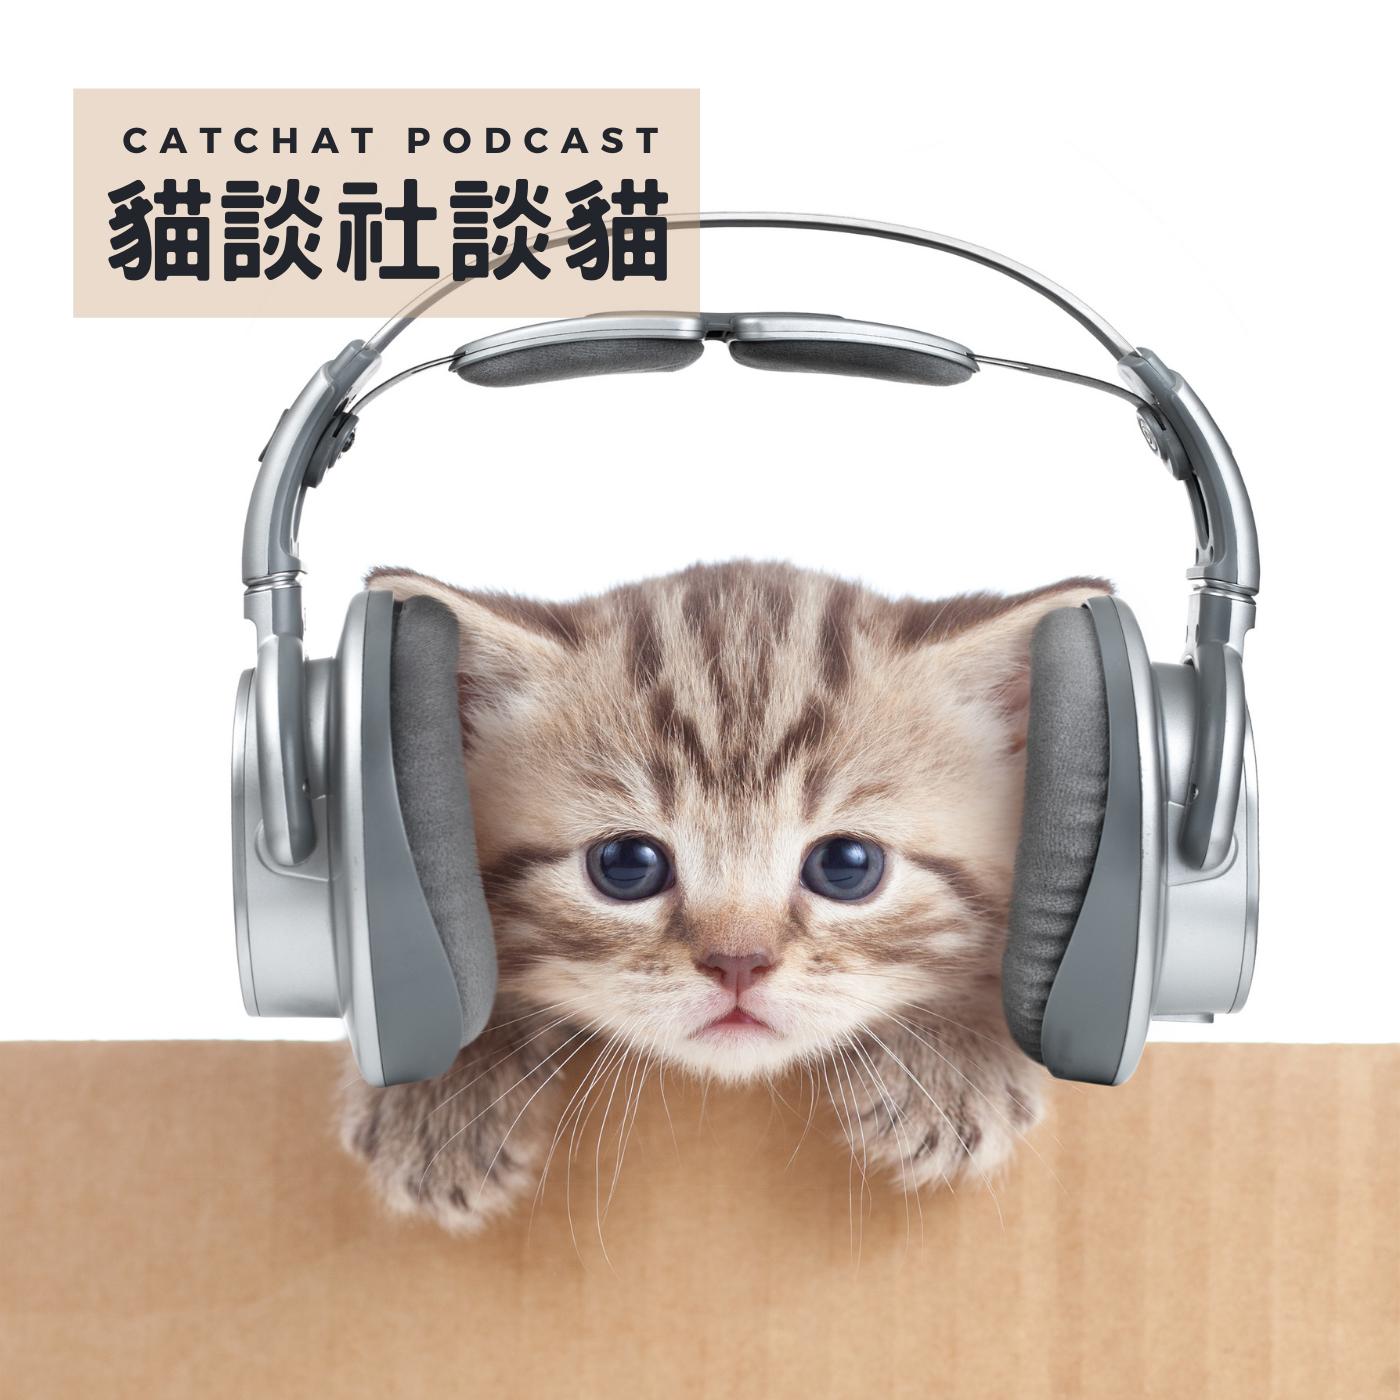 EP08! 貓咪確實是有表情的,只是人類很不會看而已?!